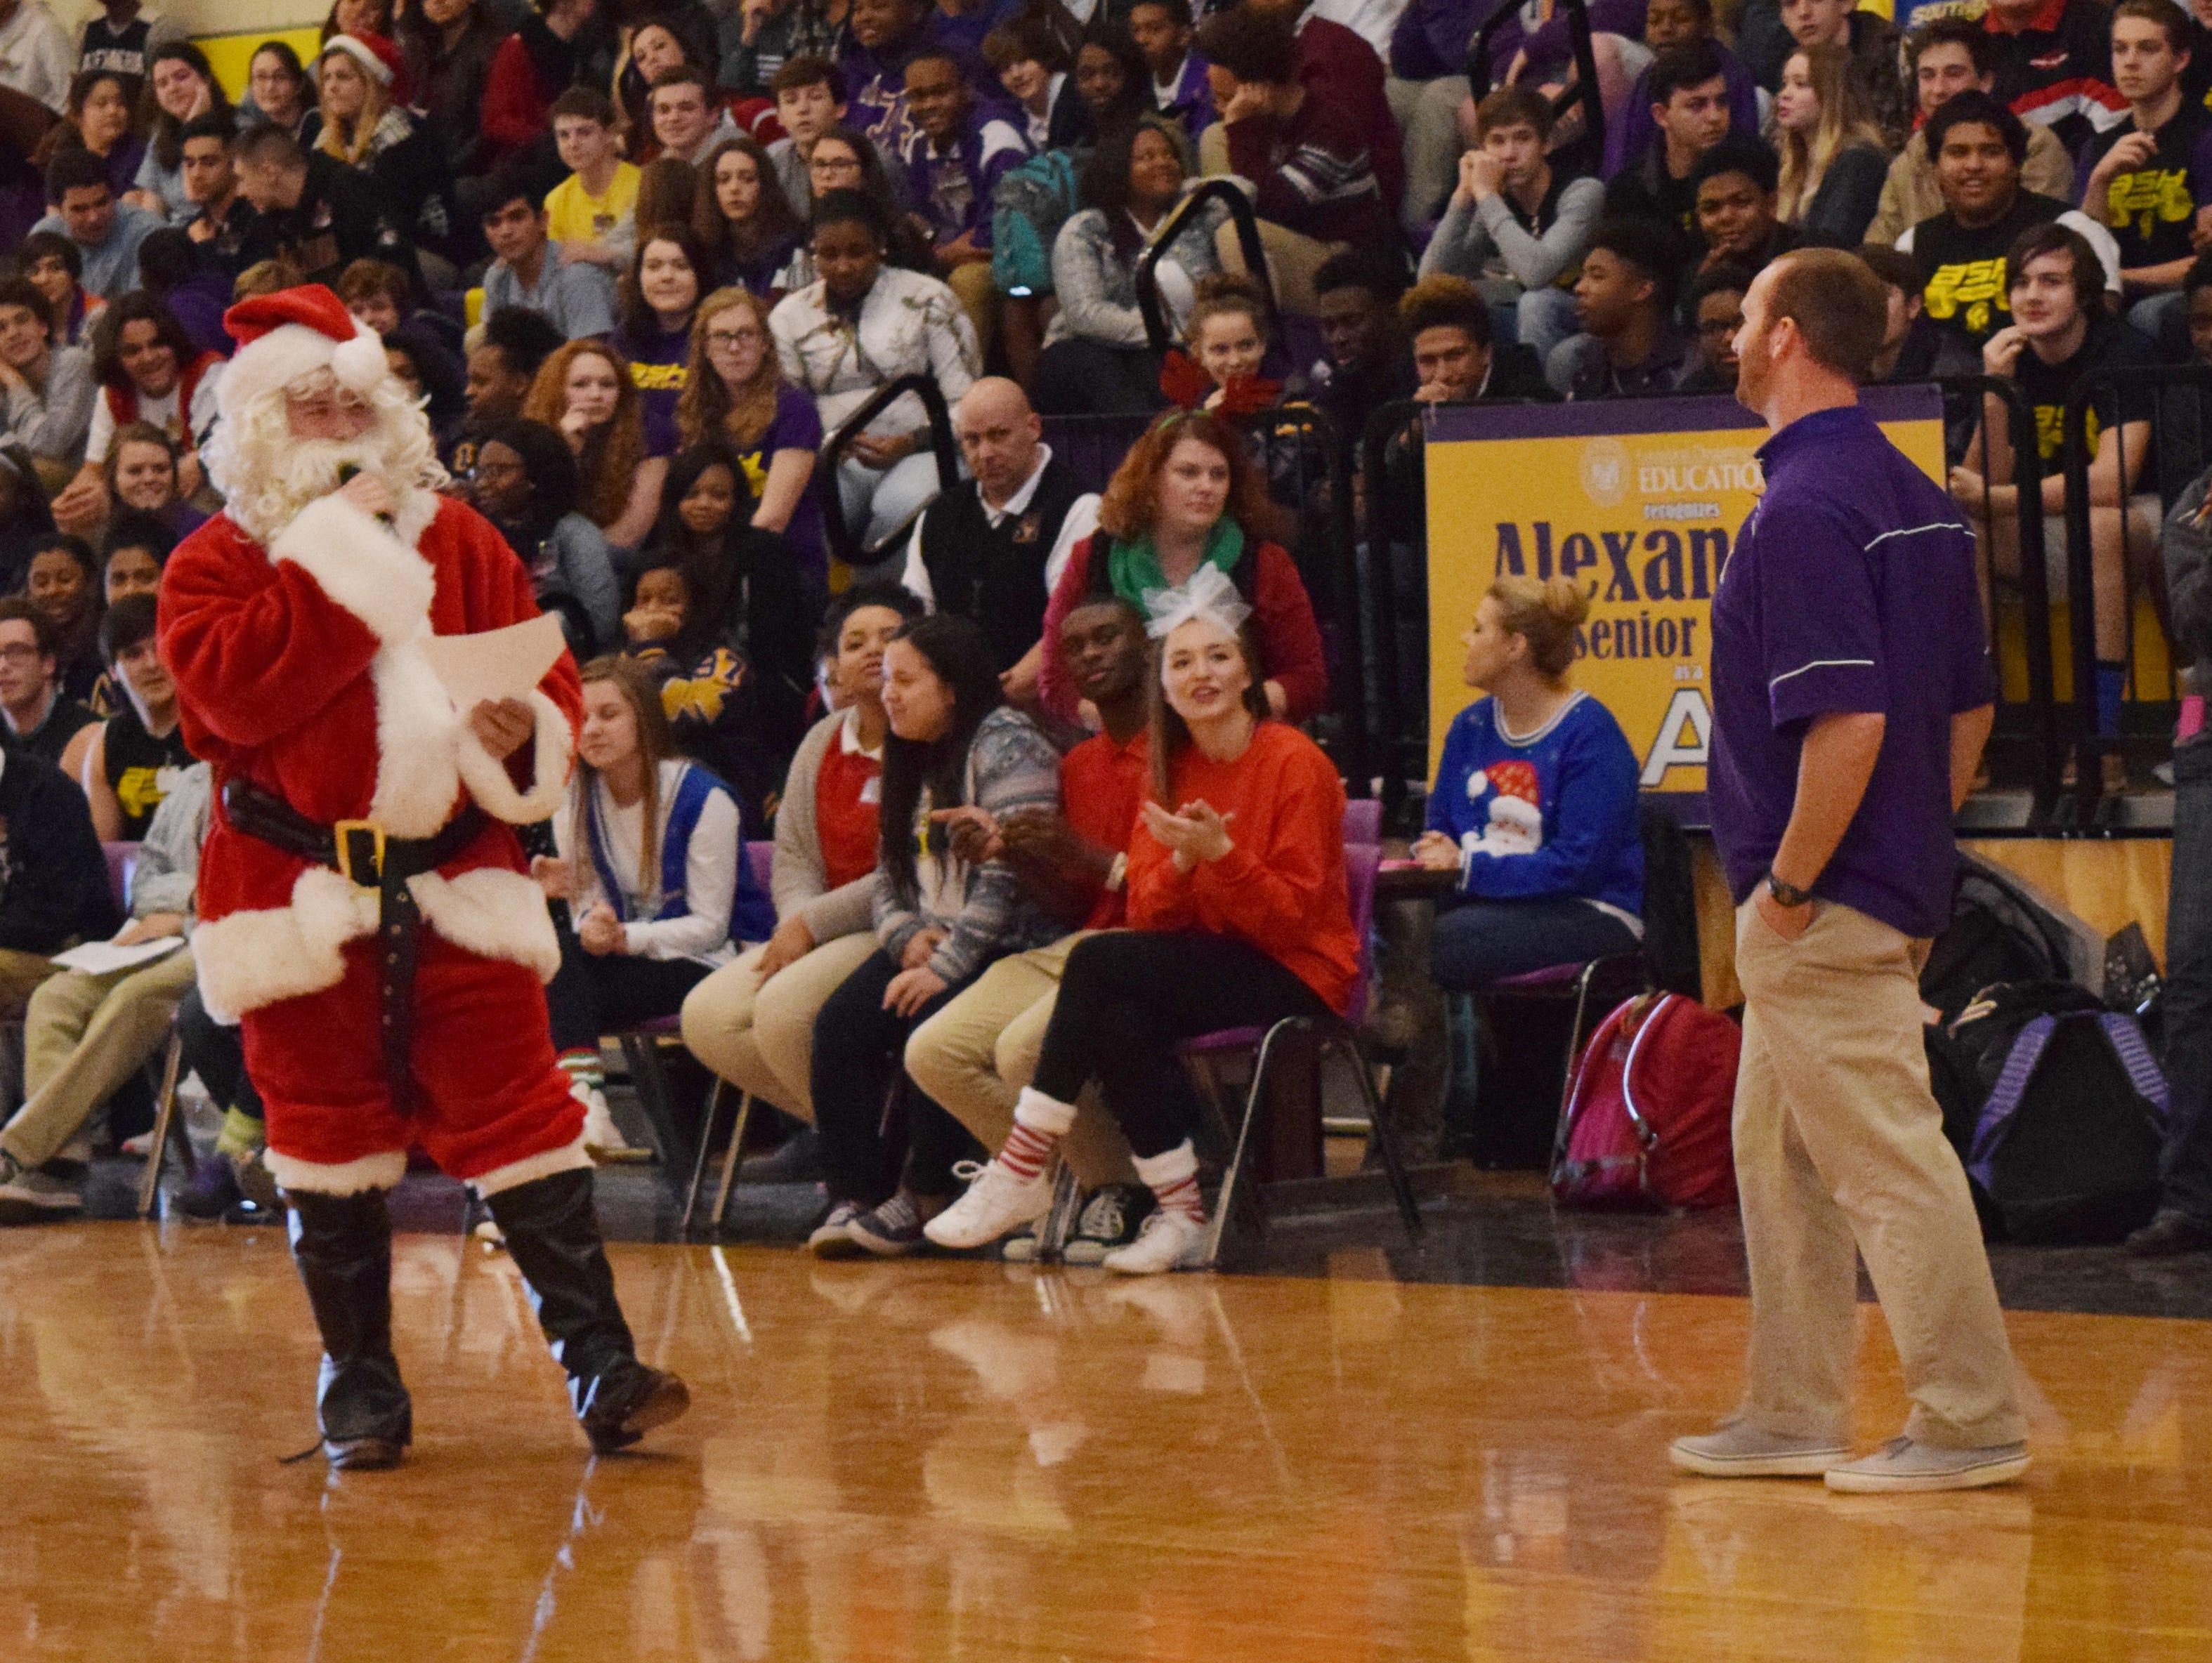 Santa Claus announces to the Alexandria Senior High School student body that Thomas Bachman (right) is the new head football coach.